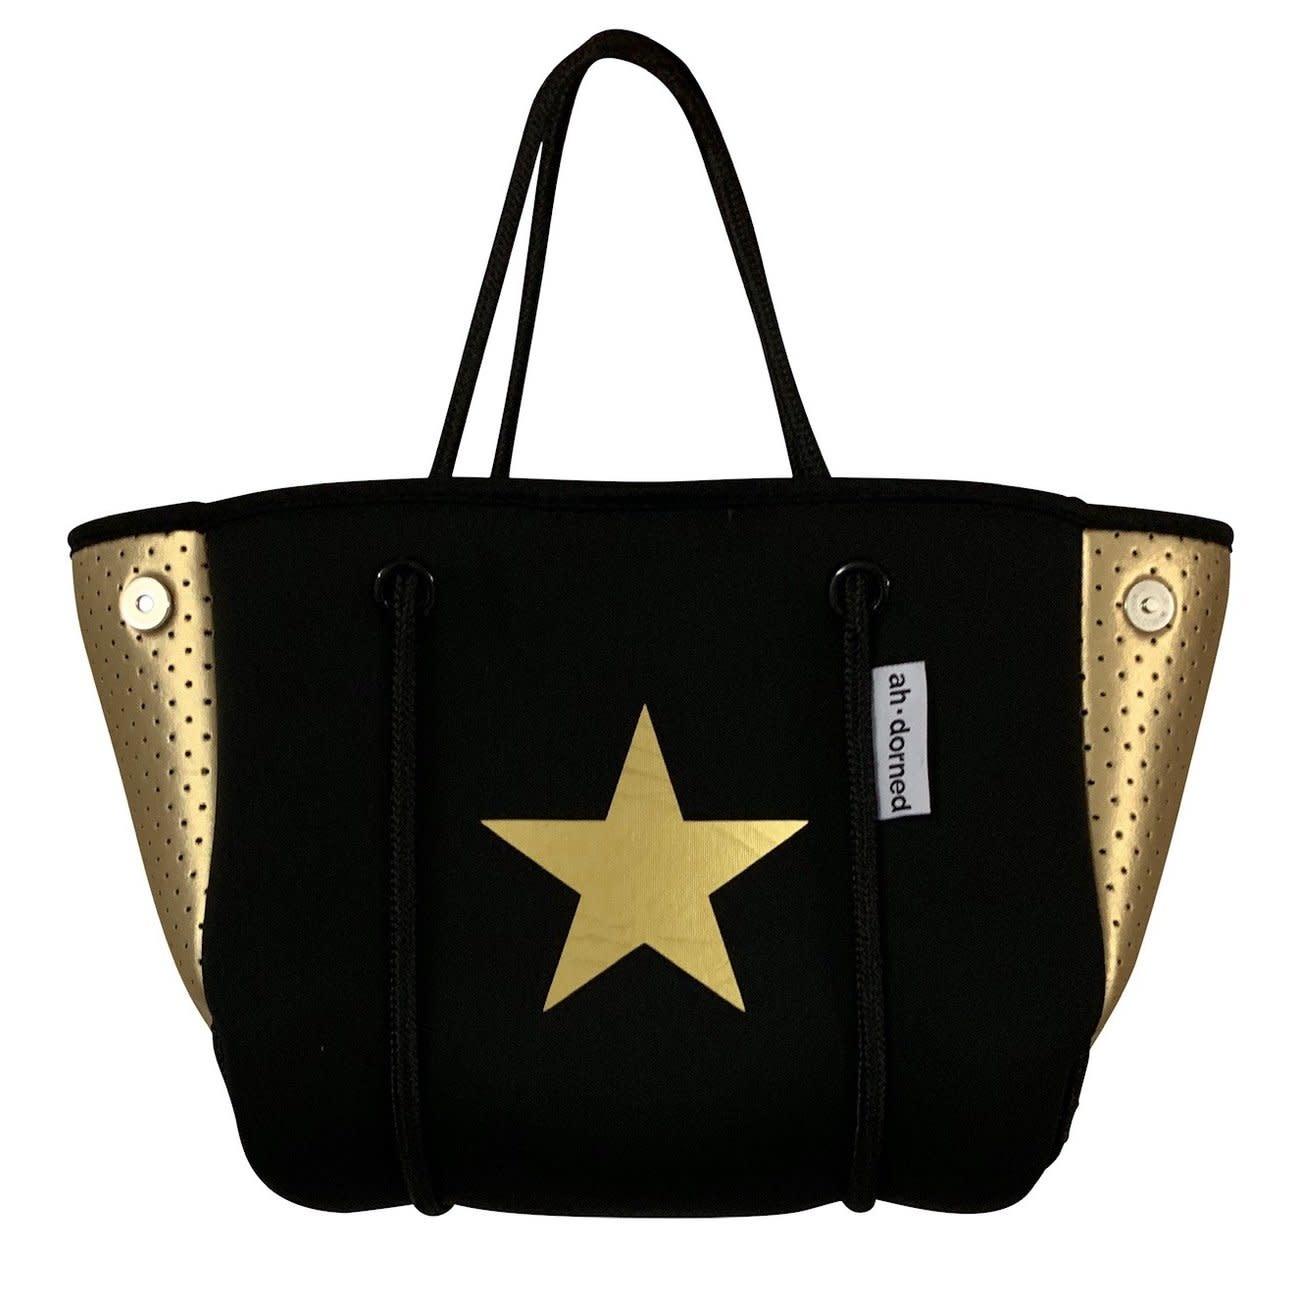 Mini Neoprene Bag with Side Panels